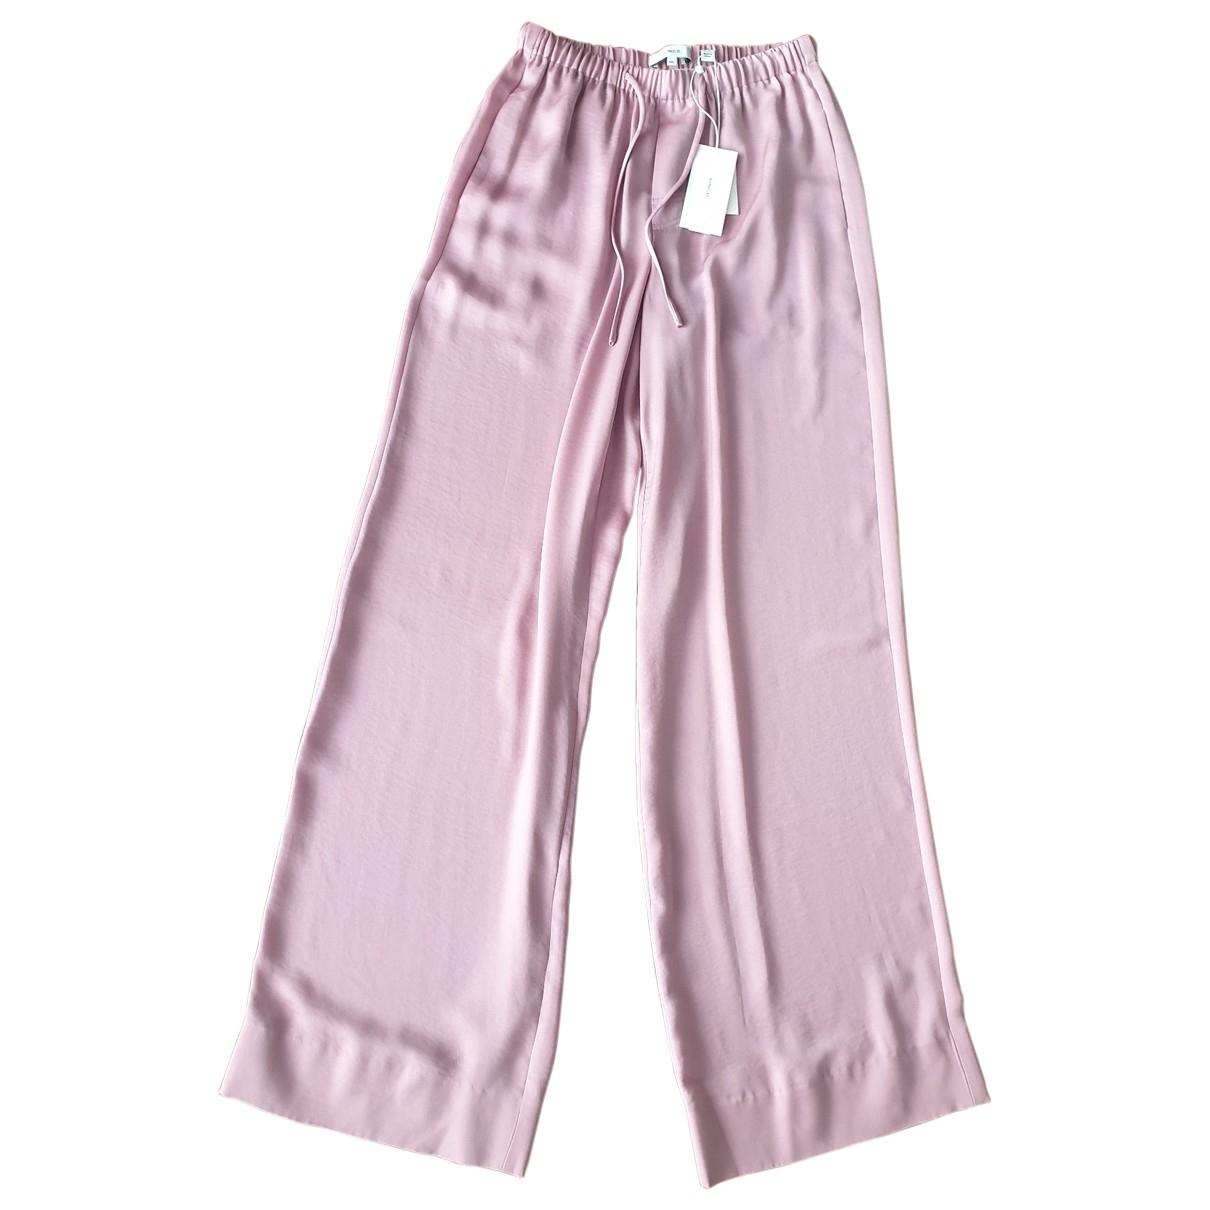 Vince \N Pink Trousers for Women XXS International